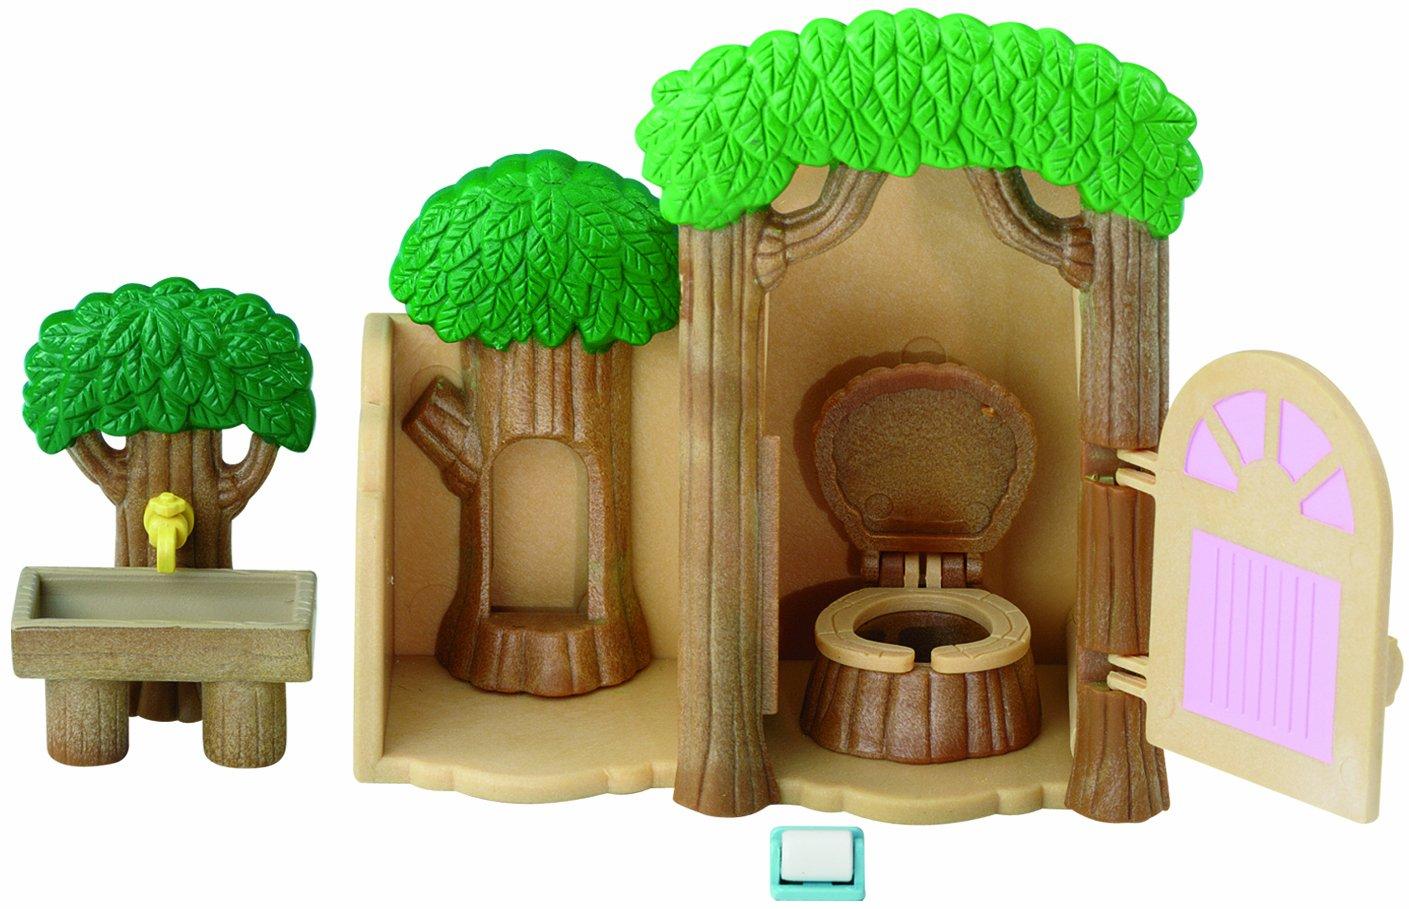 EPOCH Sylvanian Family 2687 - Kit de árbol con baño en miniatura Epoch D' enfance